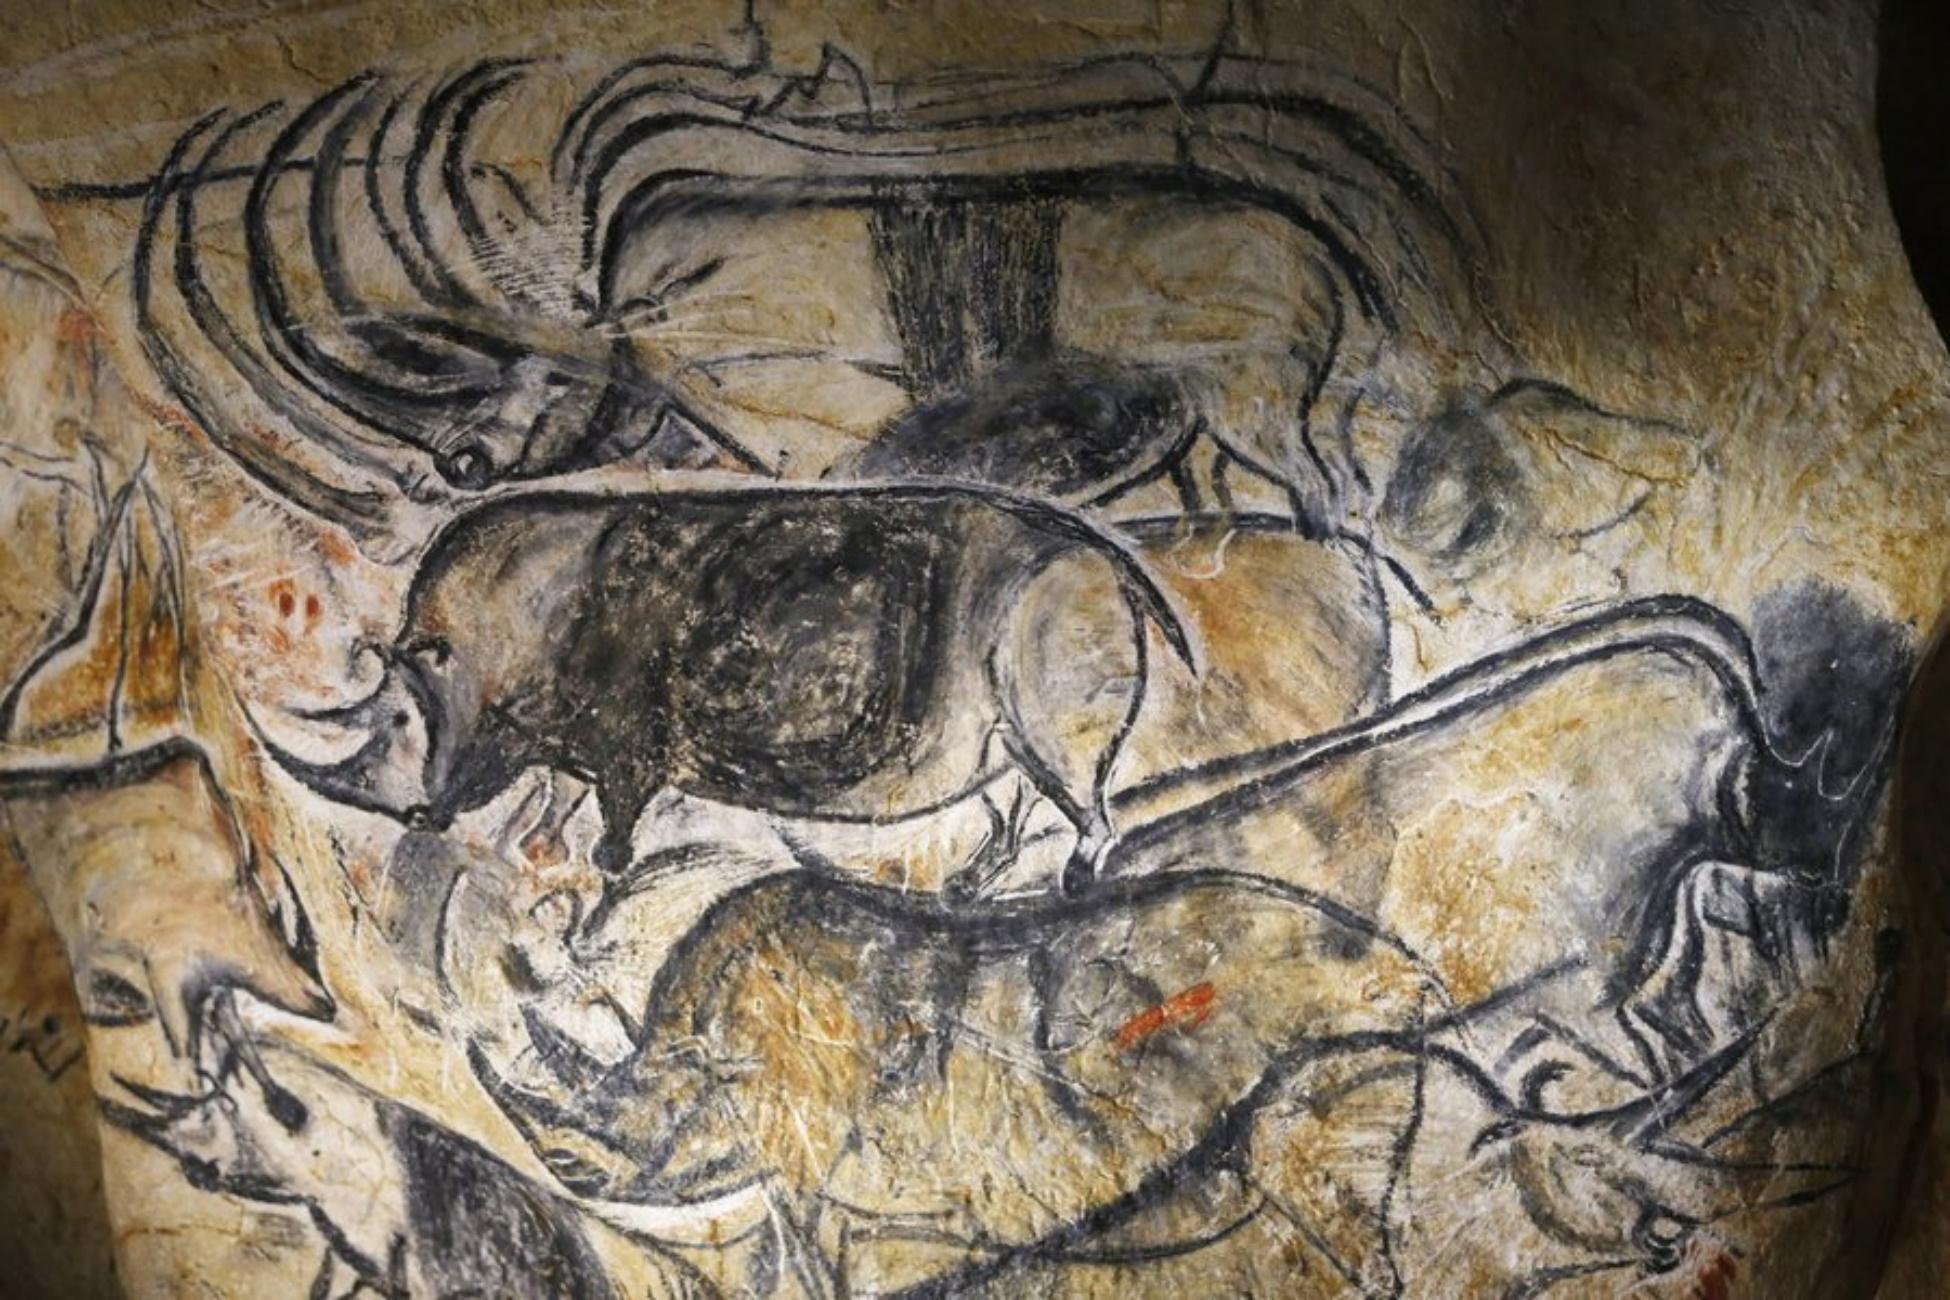 H Ανακάλυψη του Σπηλαίου Σωβέ και η άγνωστη ιστορία του